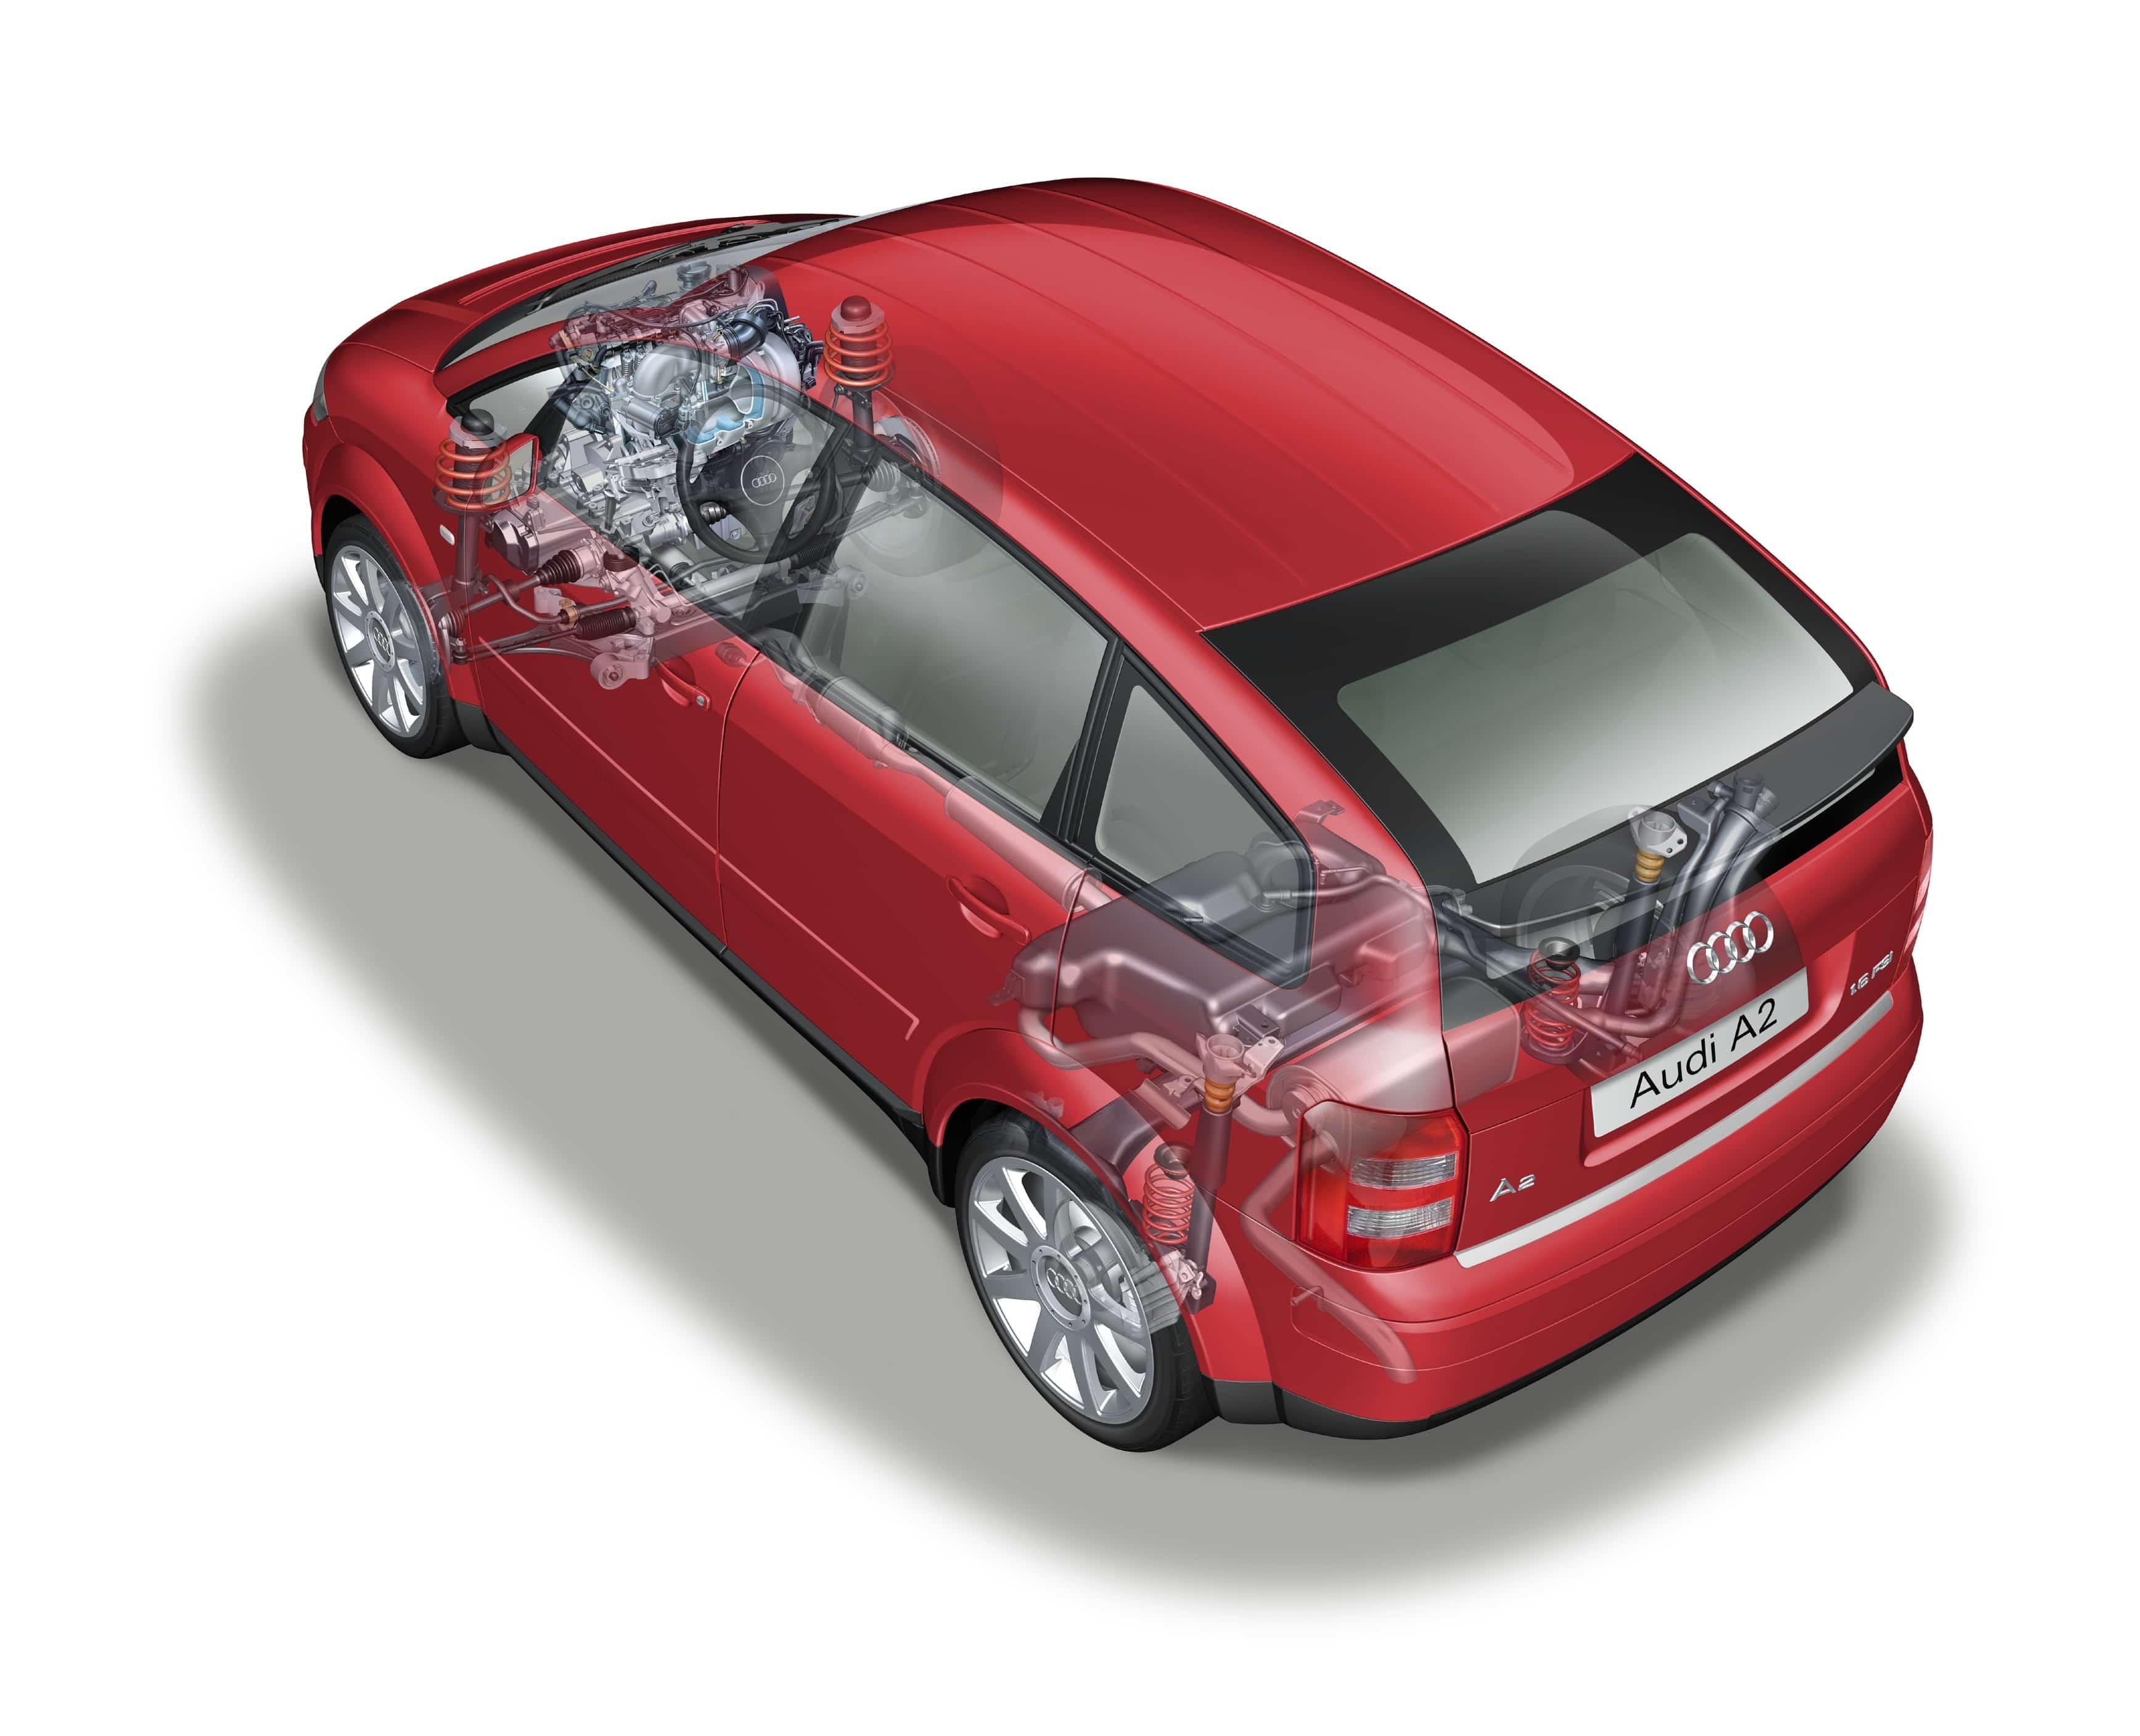 audi a2, audi, a2, cars, eco, environmental car, eco friendly, economical, aluminium, german, kate humble, motoring, automotive, cars, car, not2grand